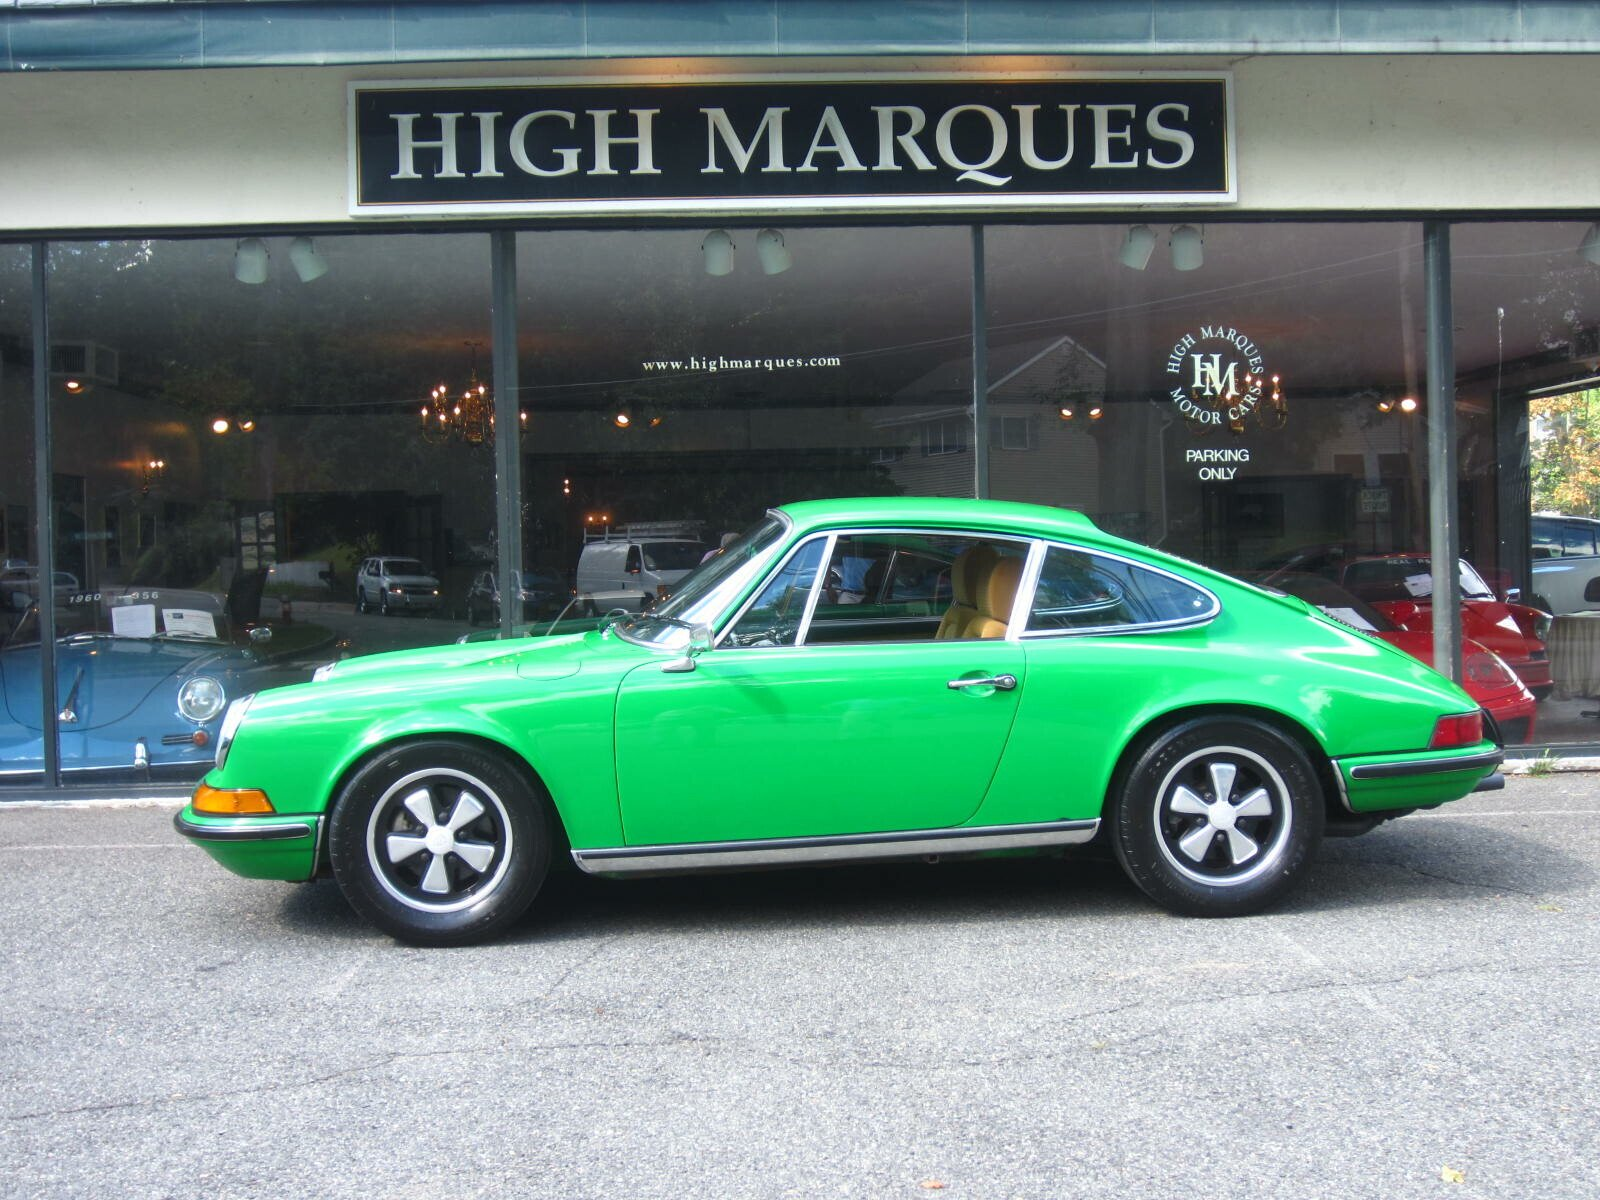 new style d36a5 891f0 1973-Porsche-911 -import-classics--Car-100782716-dd50fdb221216d2ac757bb7d174c6b09.jpg